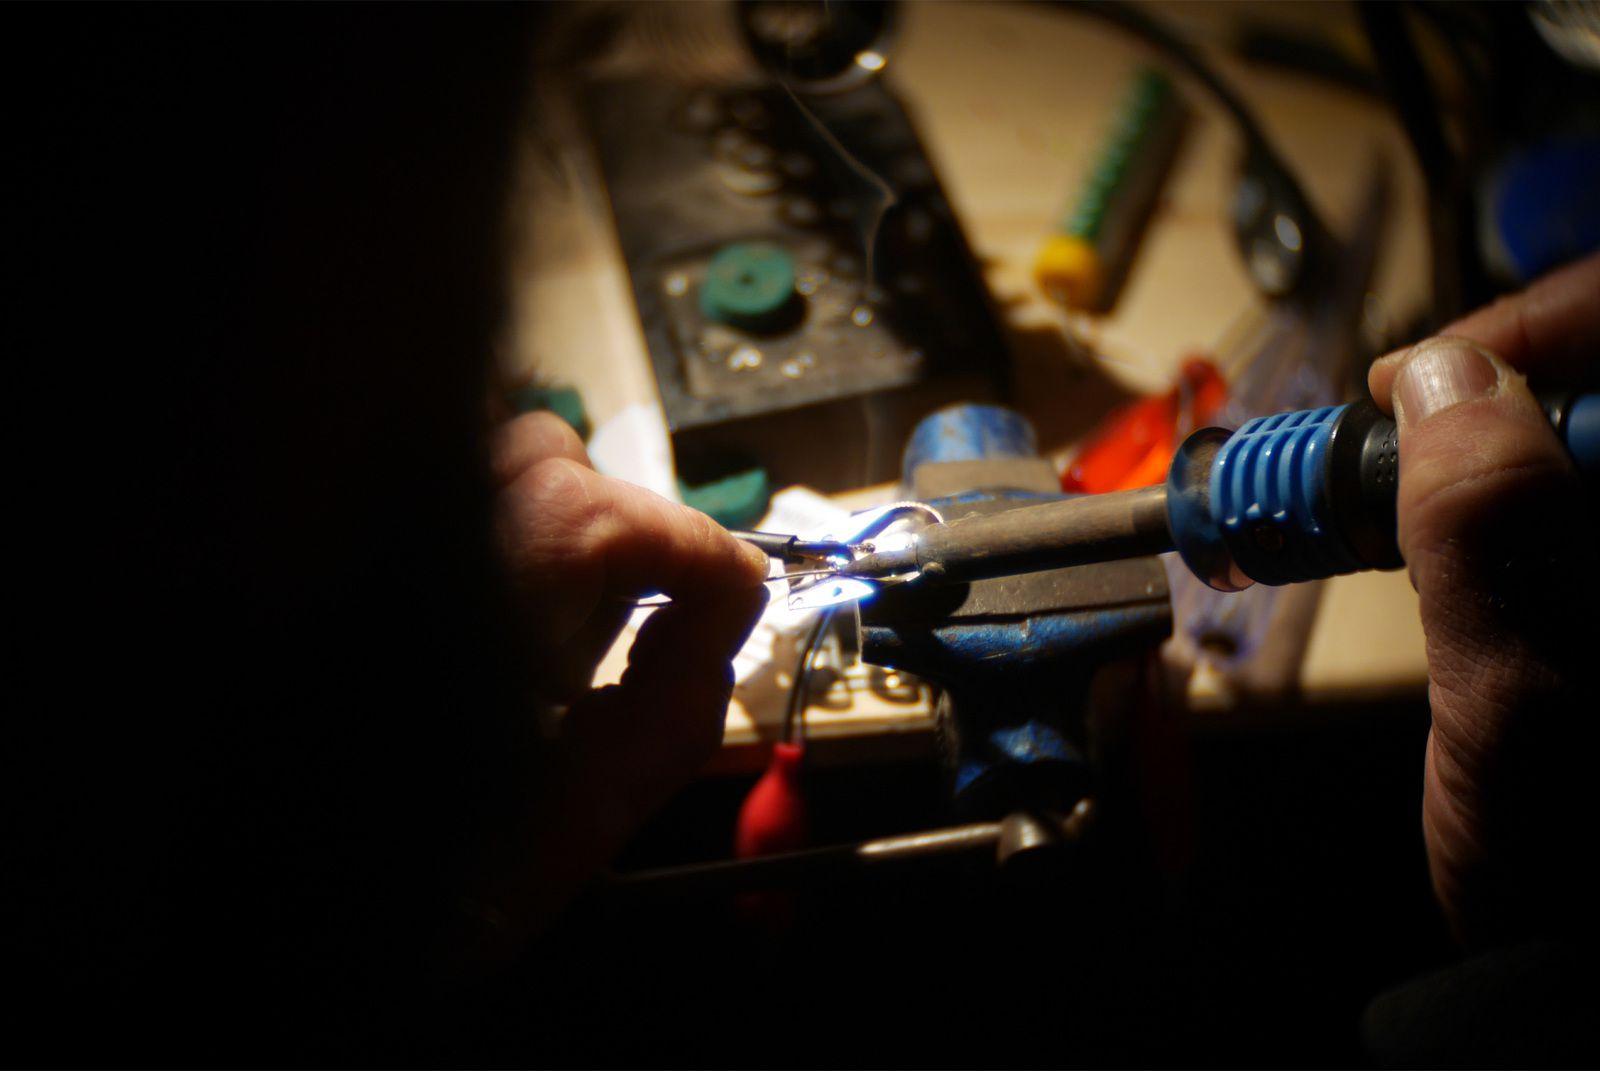 OLD KRAFTSMAN - Lap steel en réparation